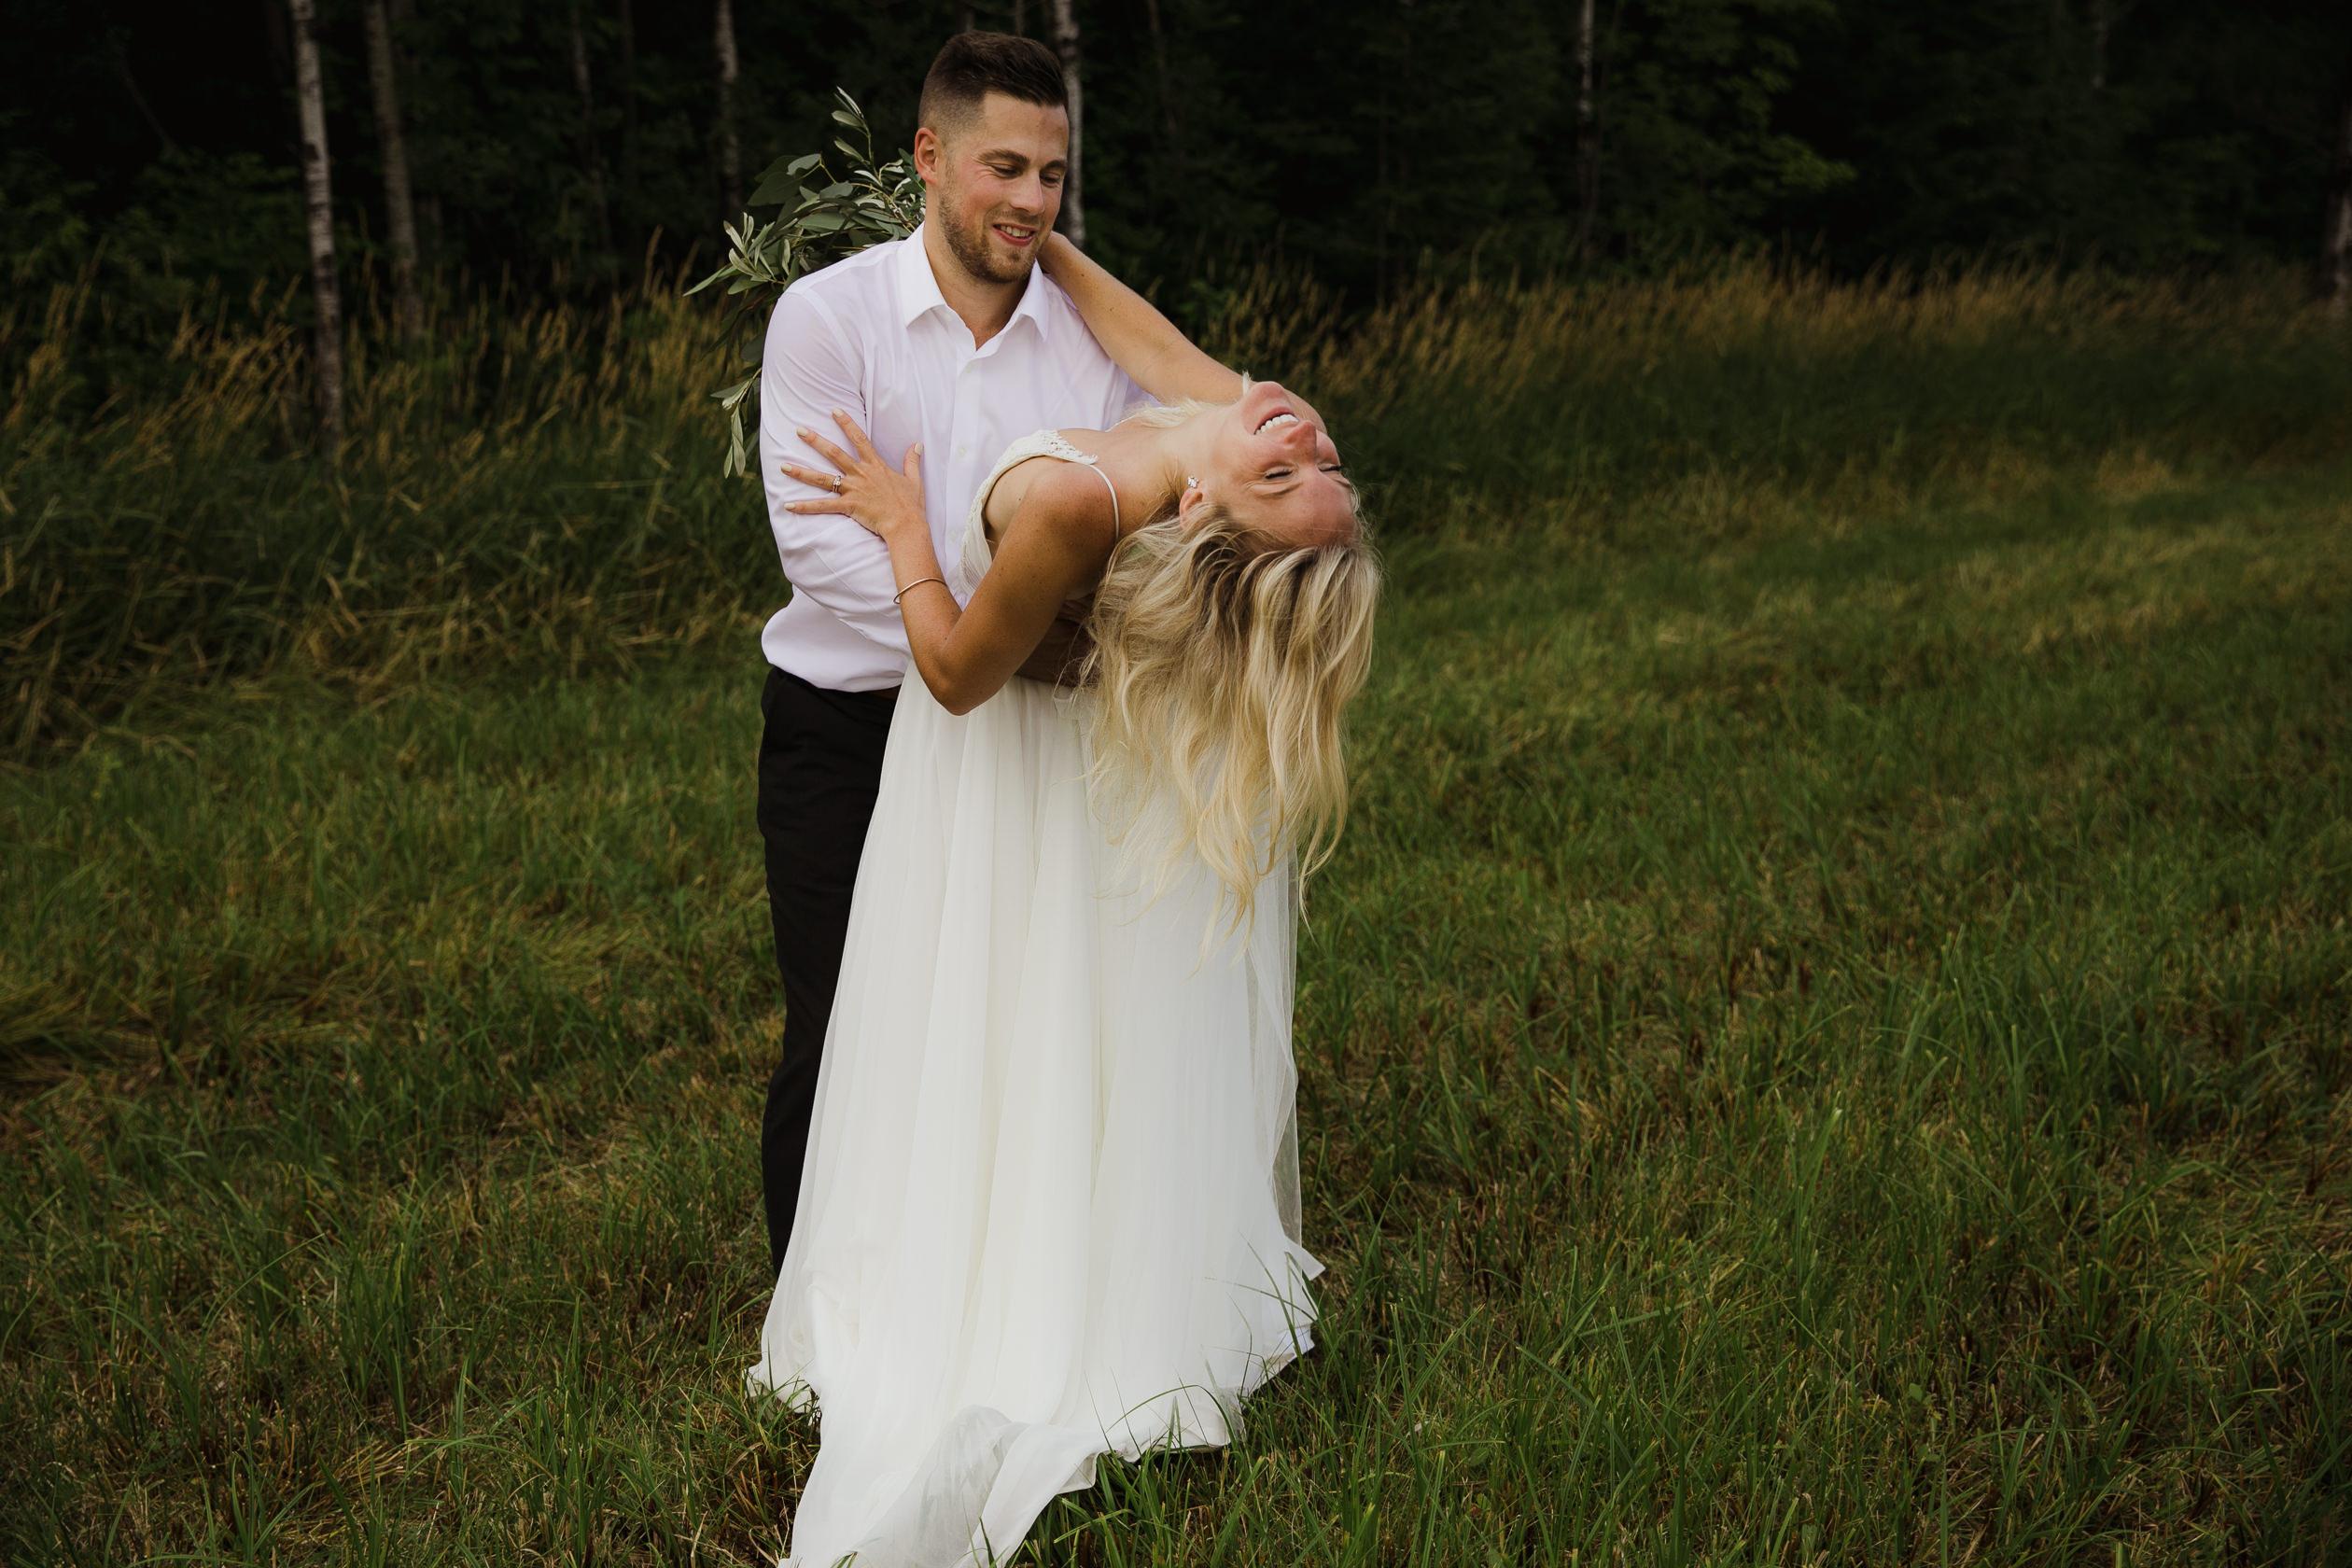 Wedding photo bride and groom portraits hair dress bouquet field summer